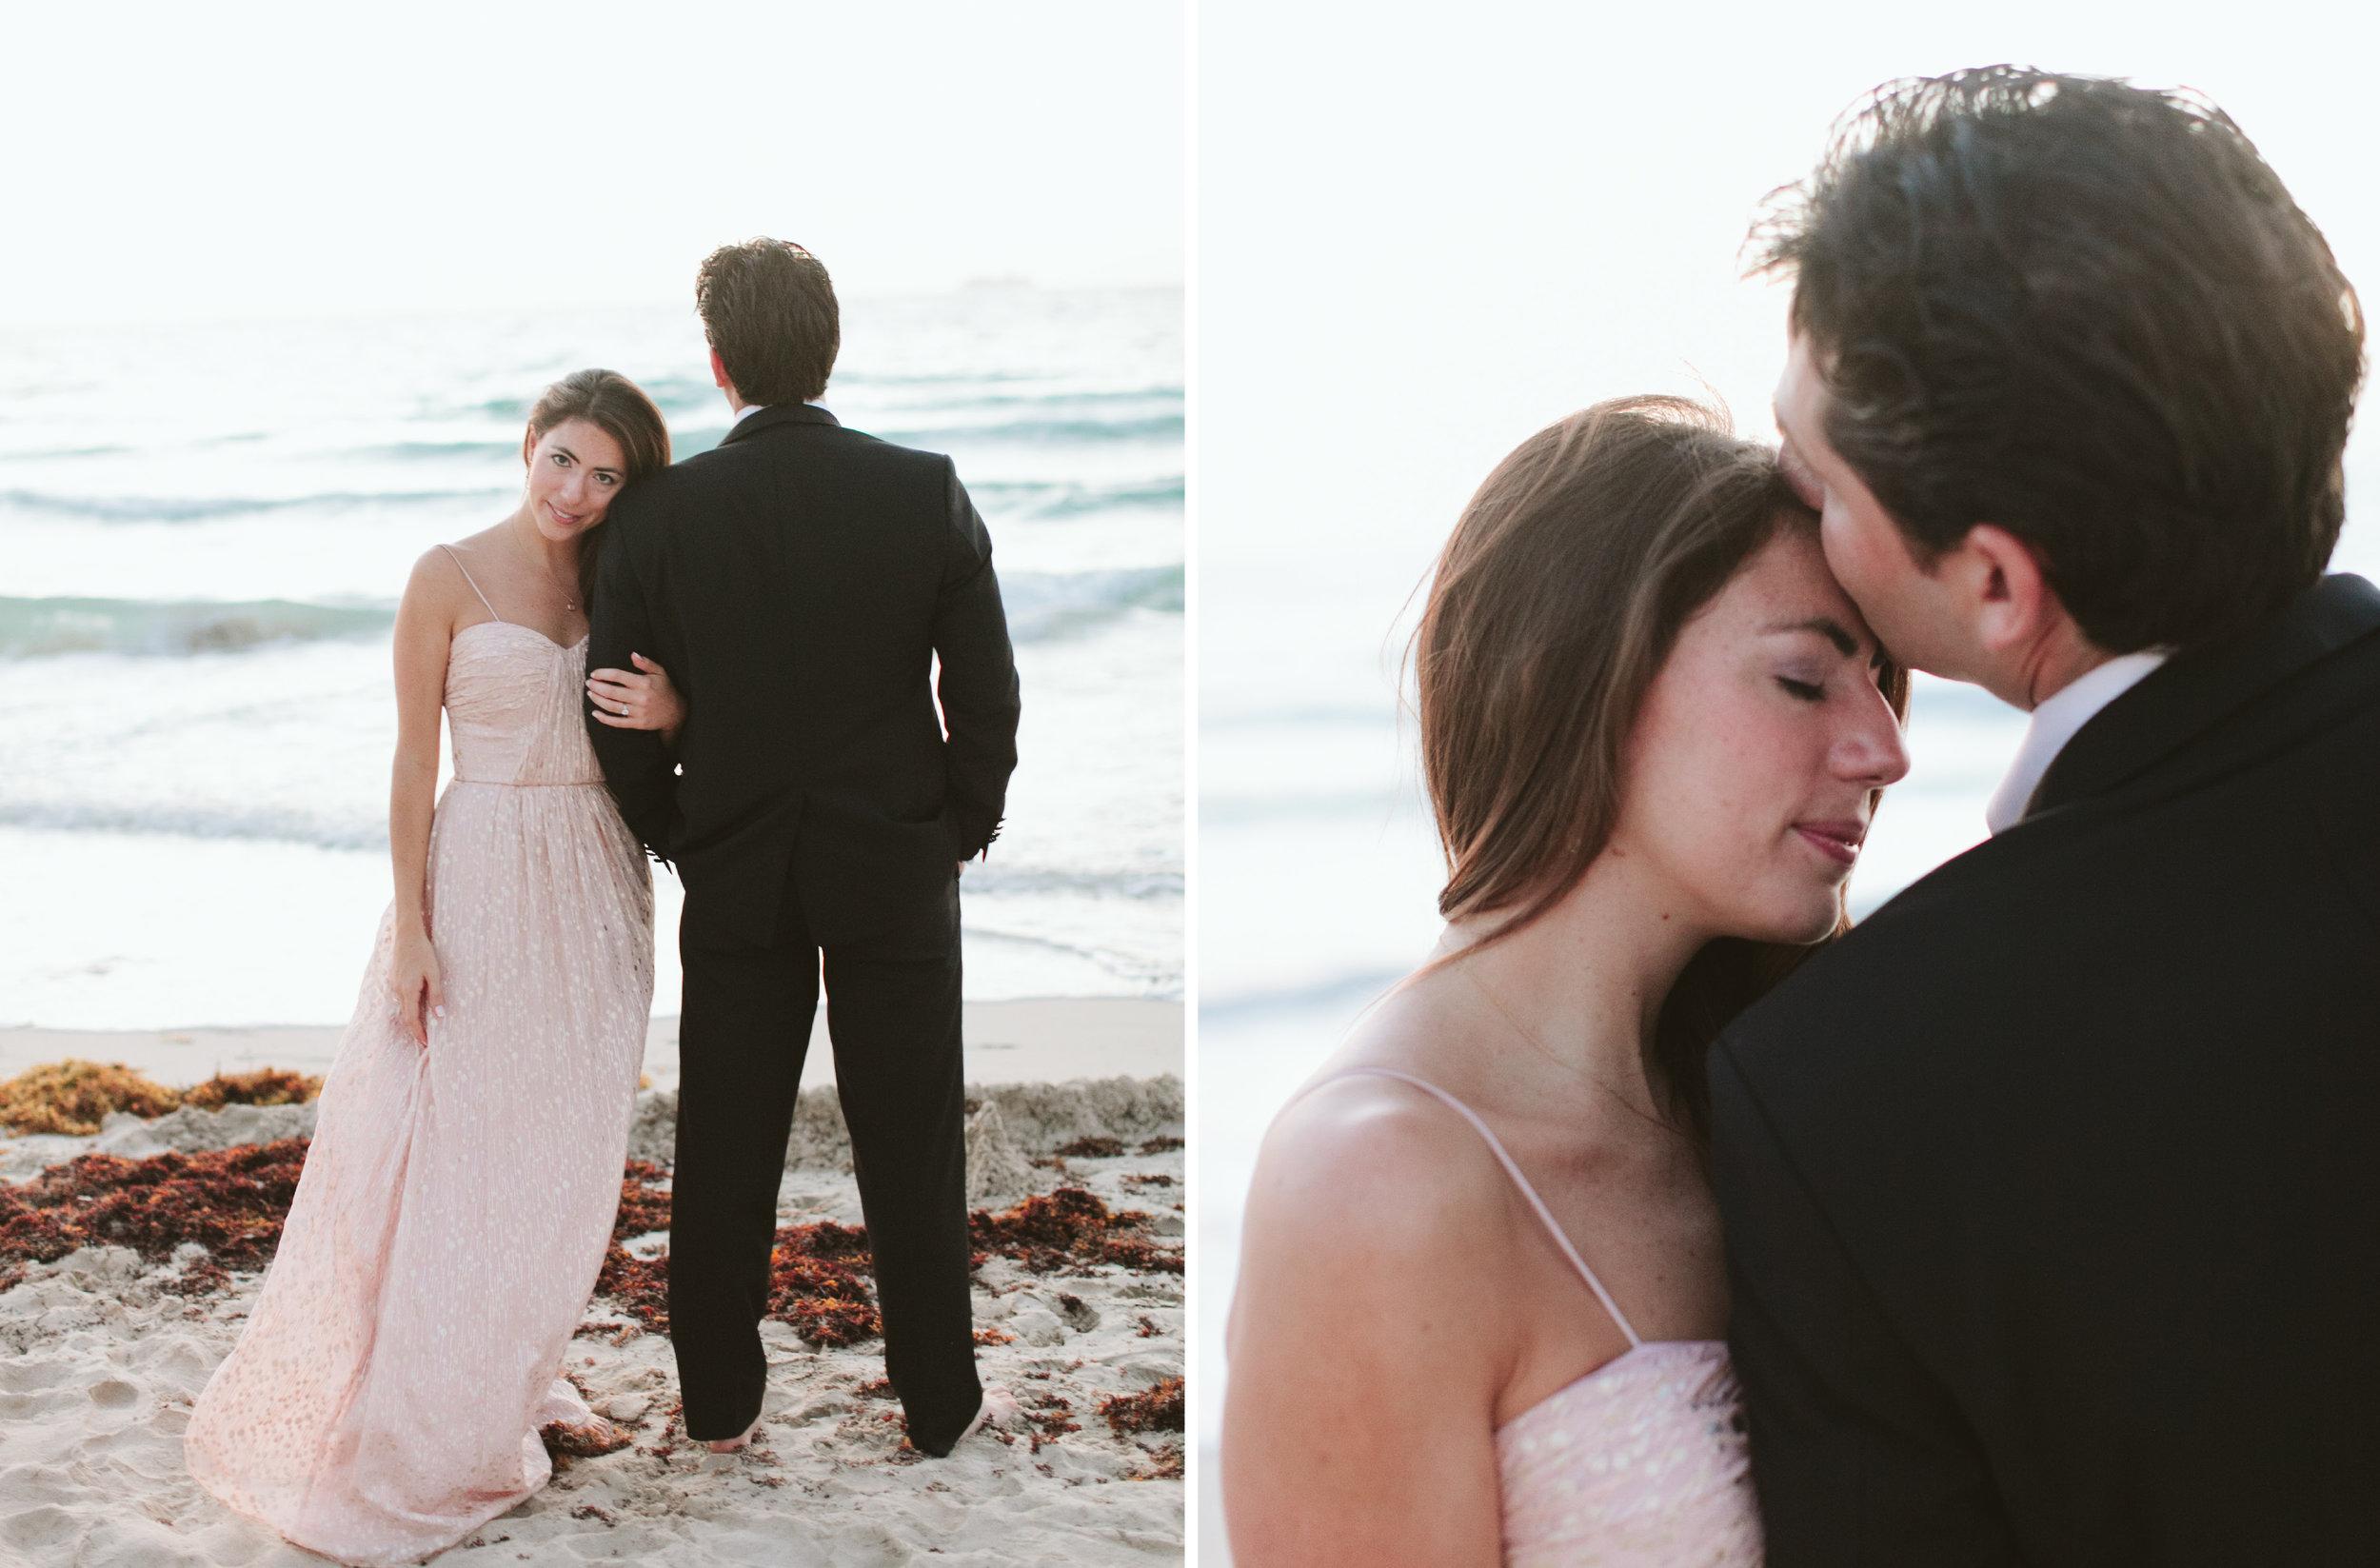 Meli + Mike South Pointe Park South Beach Miami Engagement Shoot13.jpg